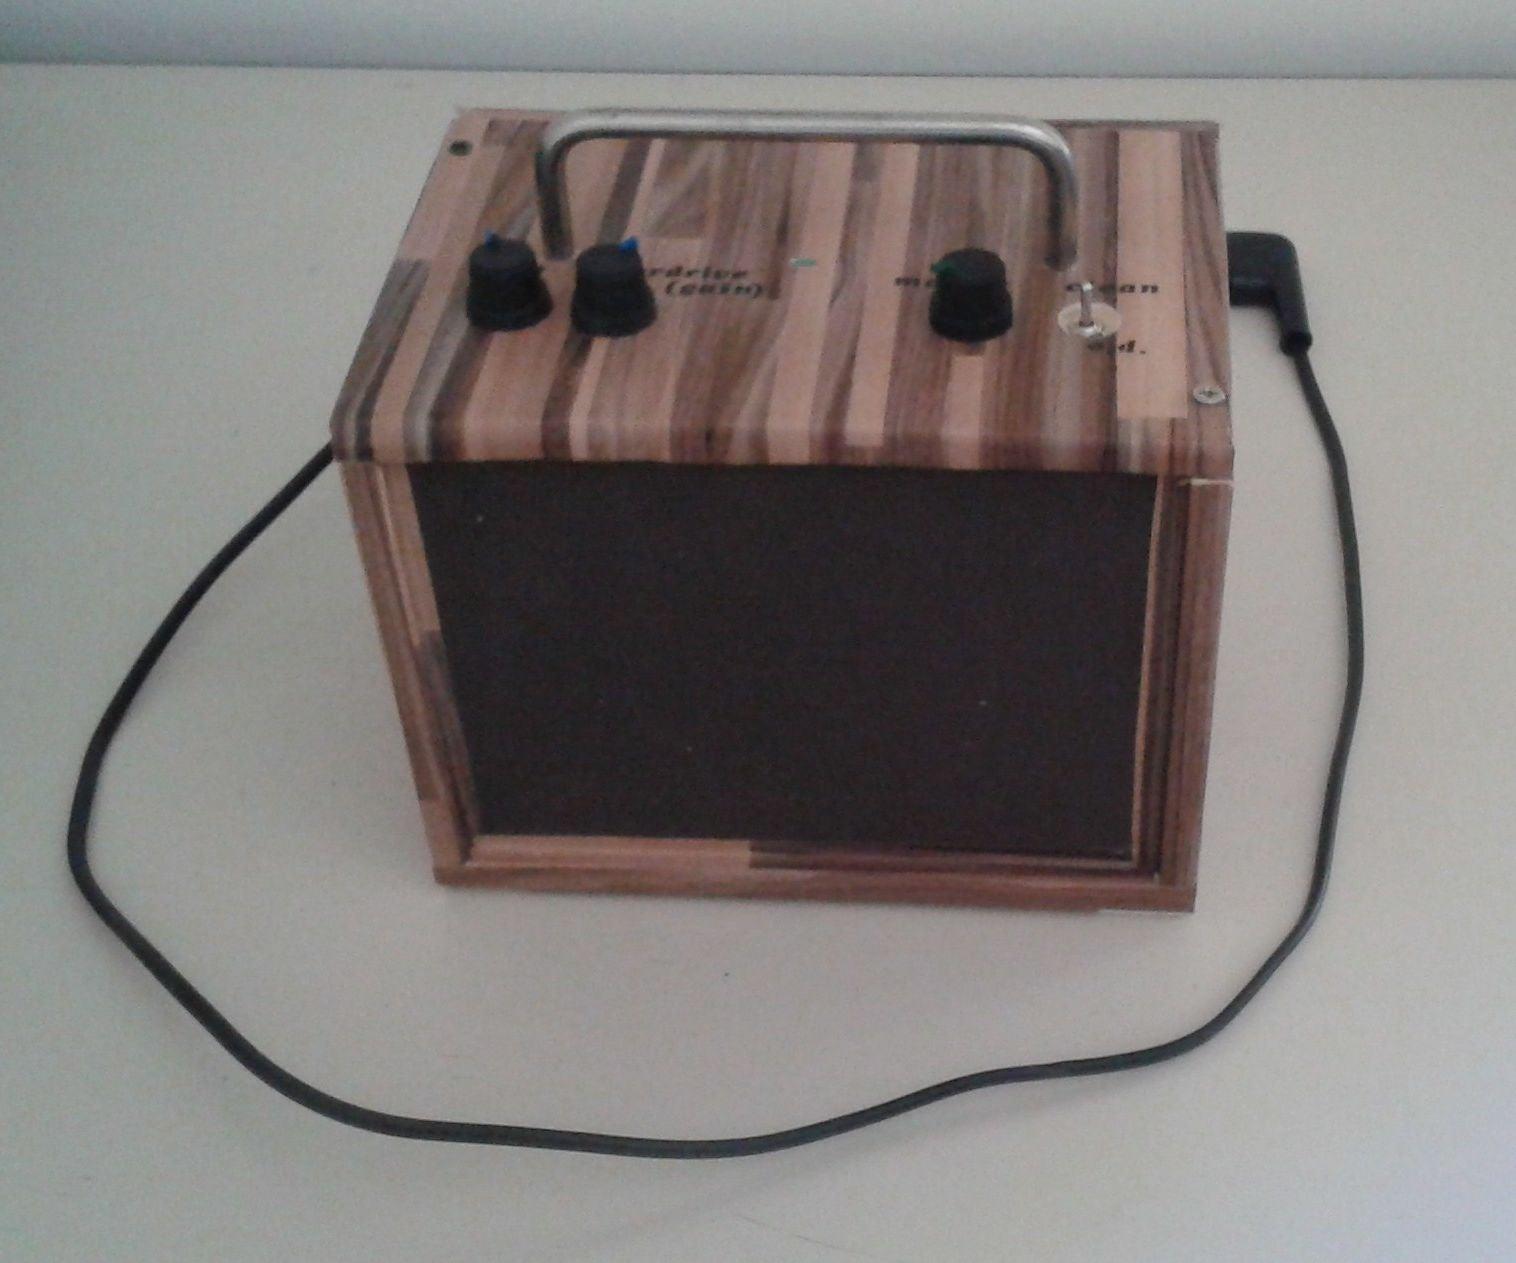 10 Watt Portable Guitar Amp With Distortion 7 Steps Pictures Tda2030 Audio Amplifier Circuit Diagram